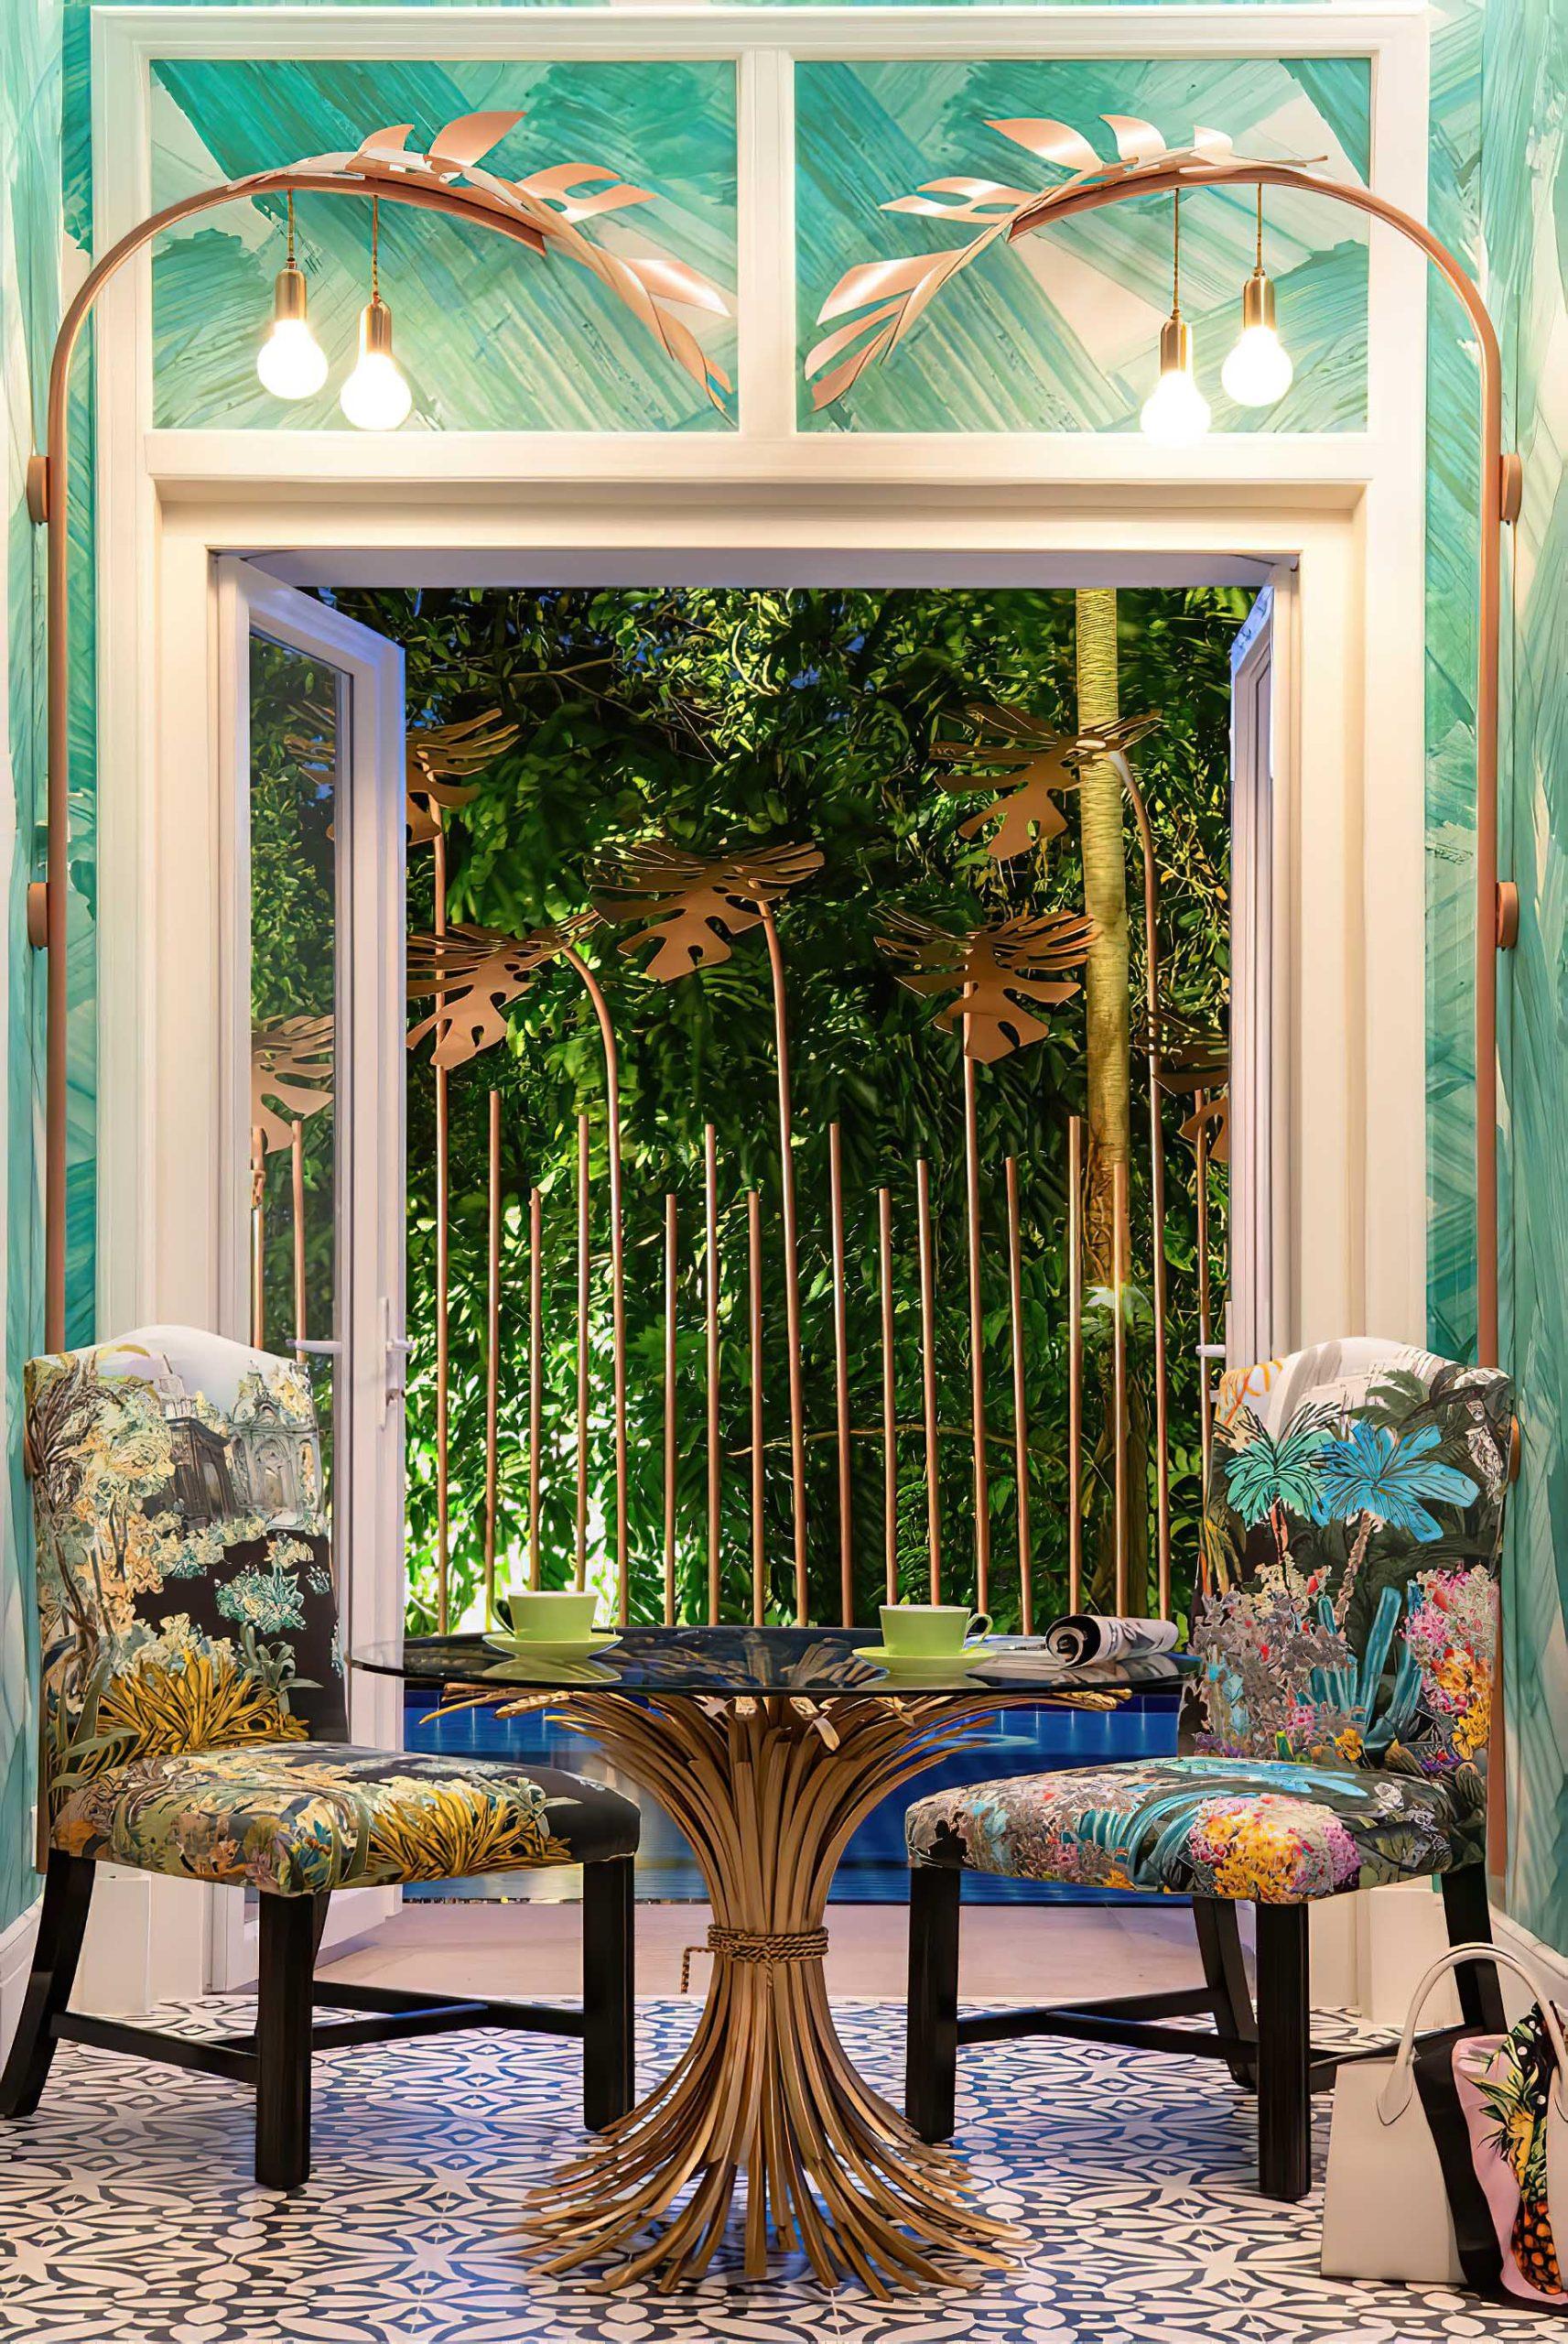 Tropical Maximalist Home Interior Singapore - Design Intervention